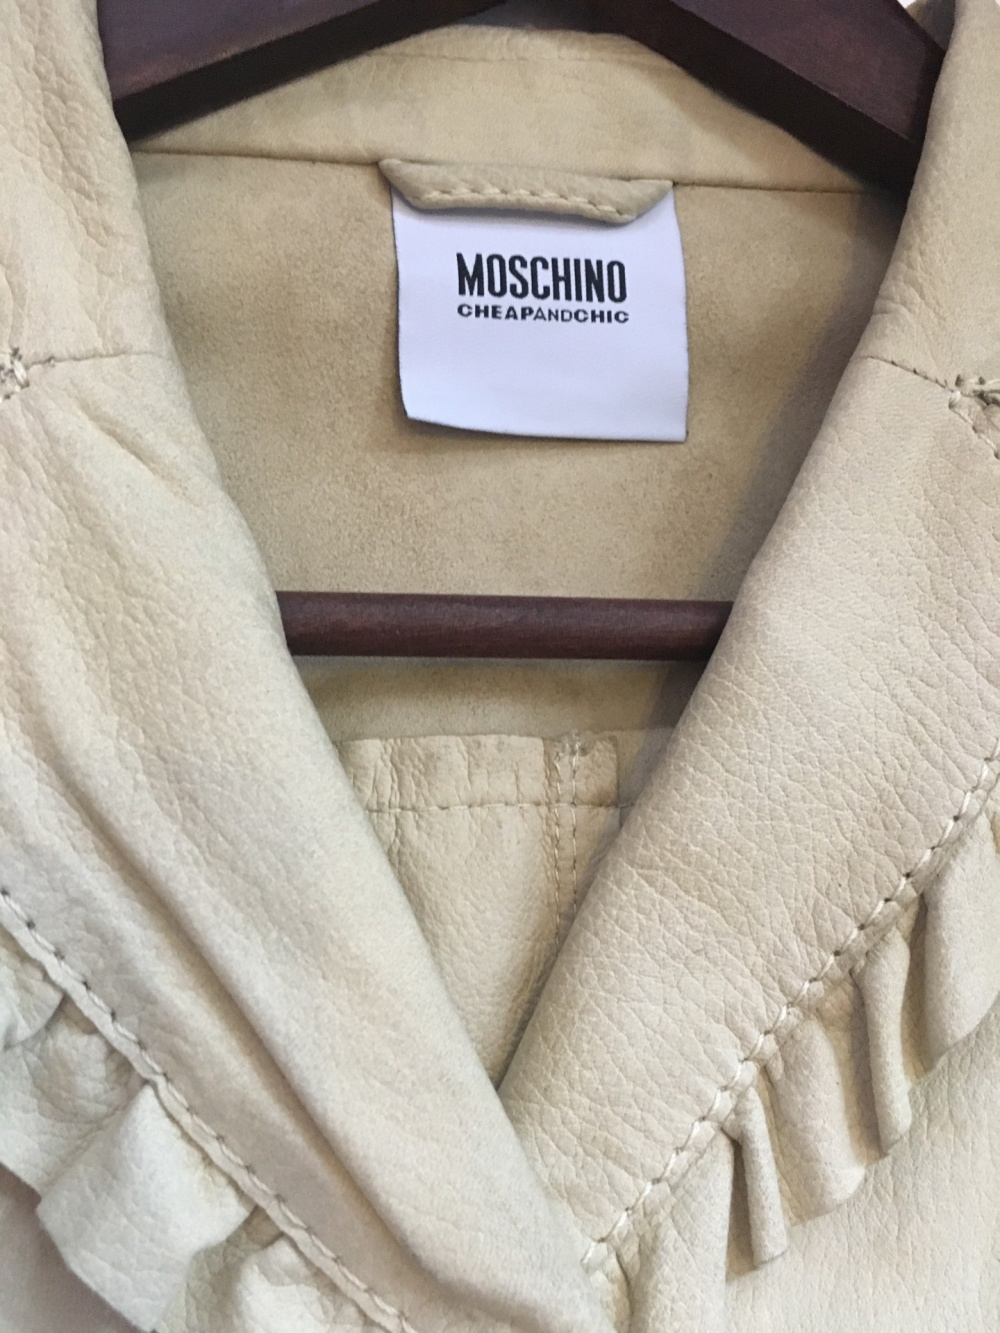 Плащ Moschino Cheap and Chic, размер 40-42